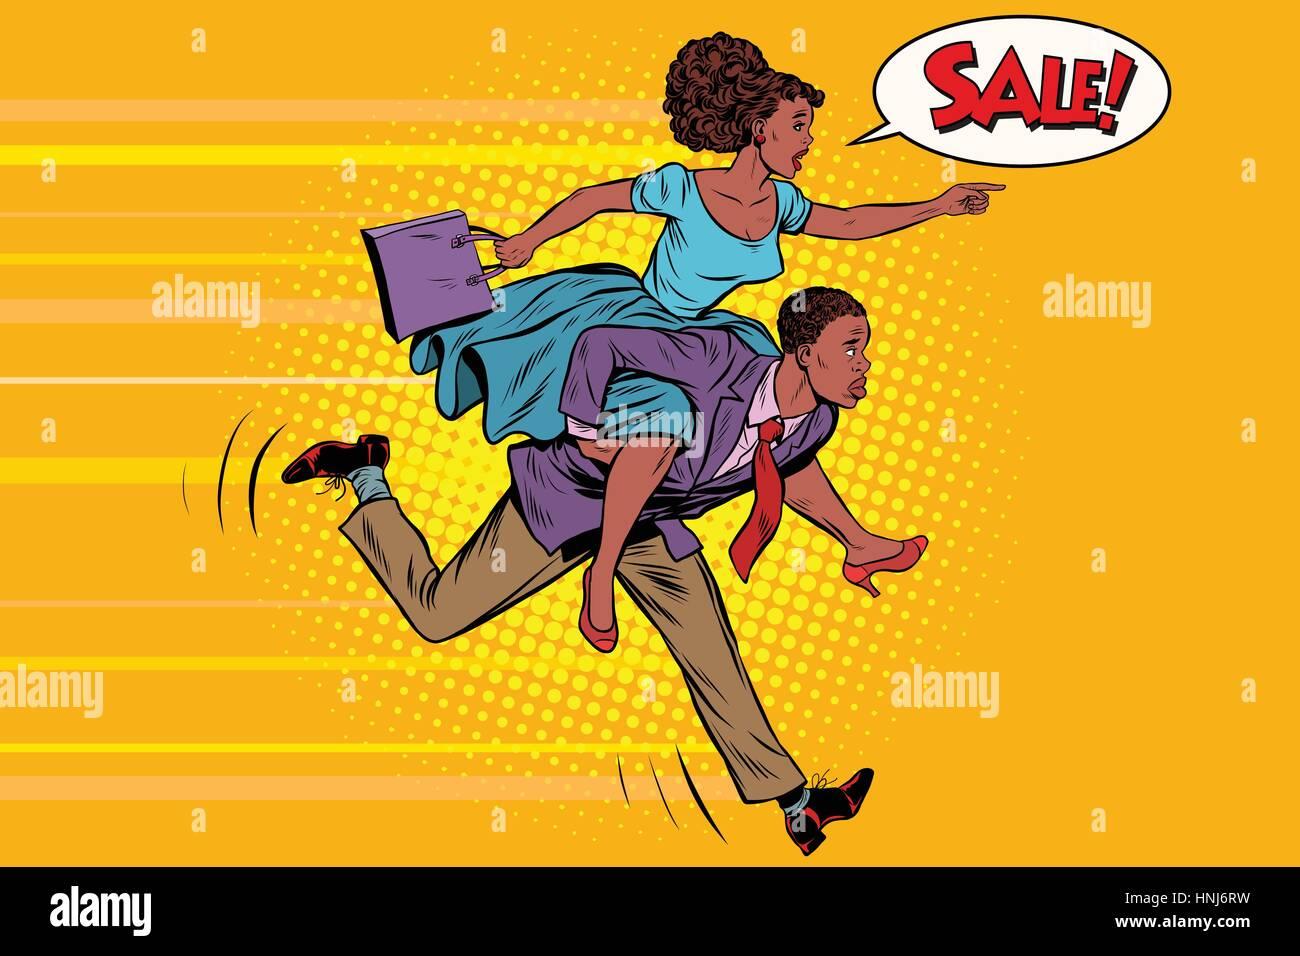 wife riding husband runs on sale. Vintage pop art retro vector. High demand. African American people - Stock Vector